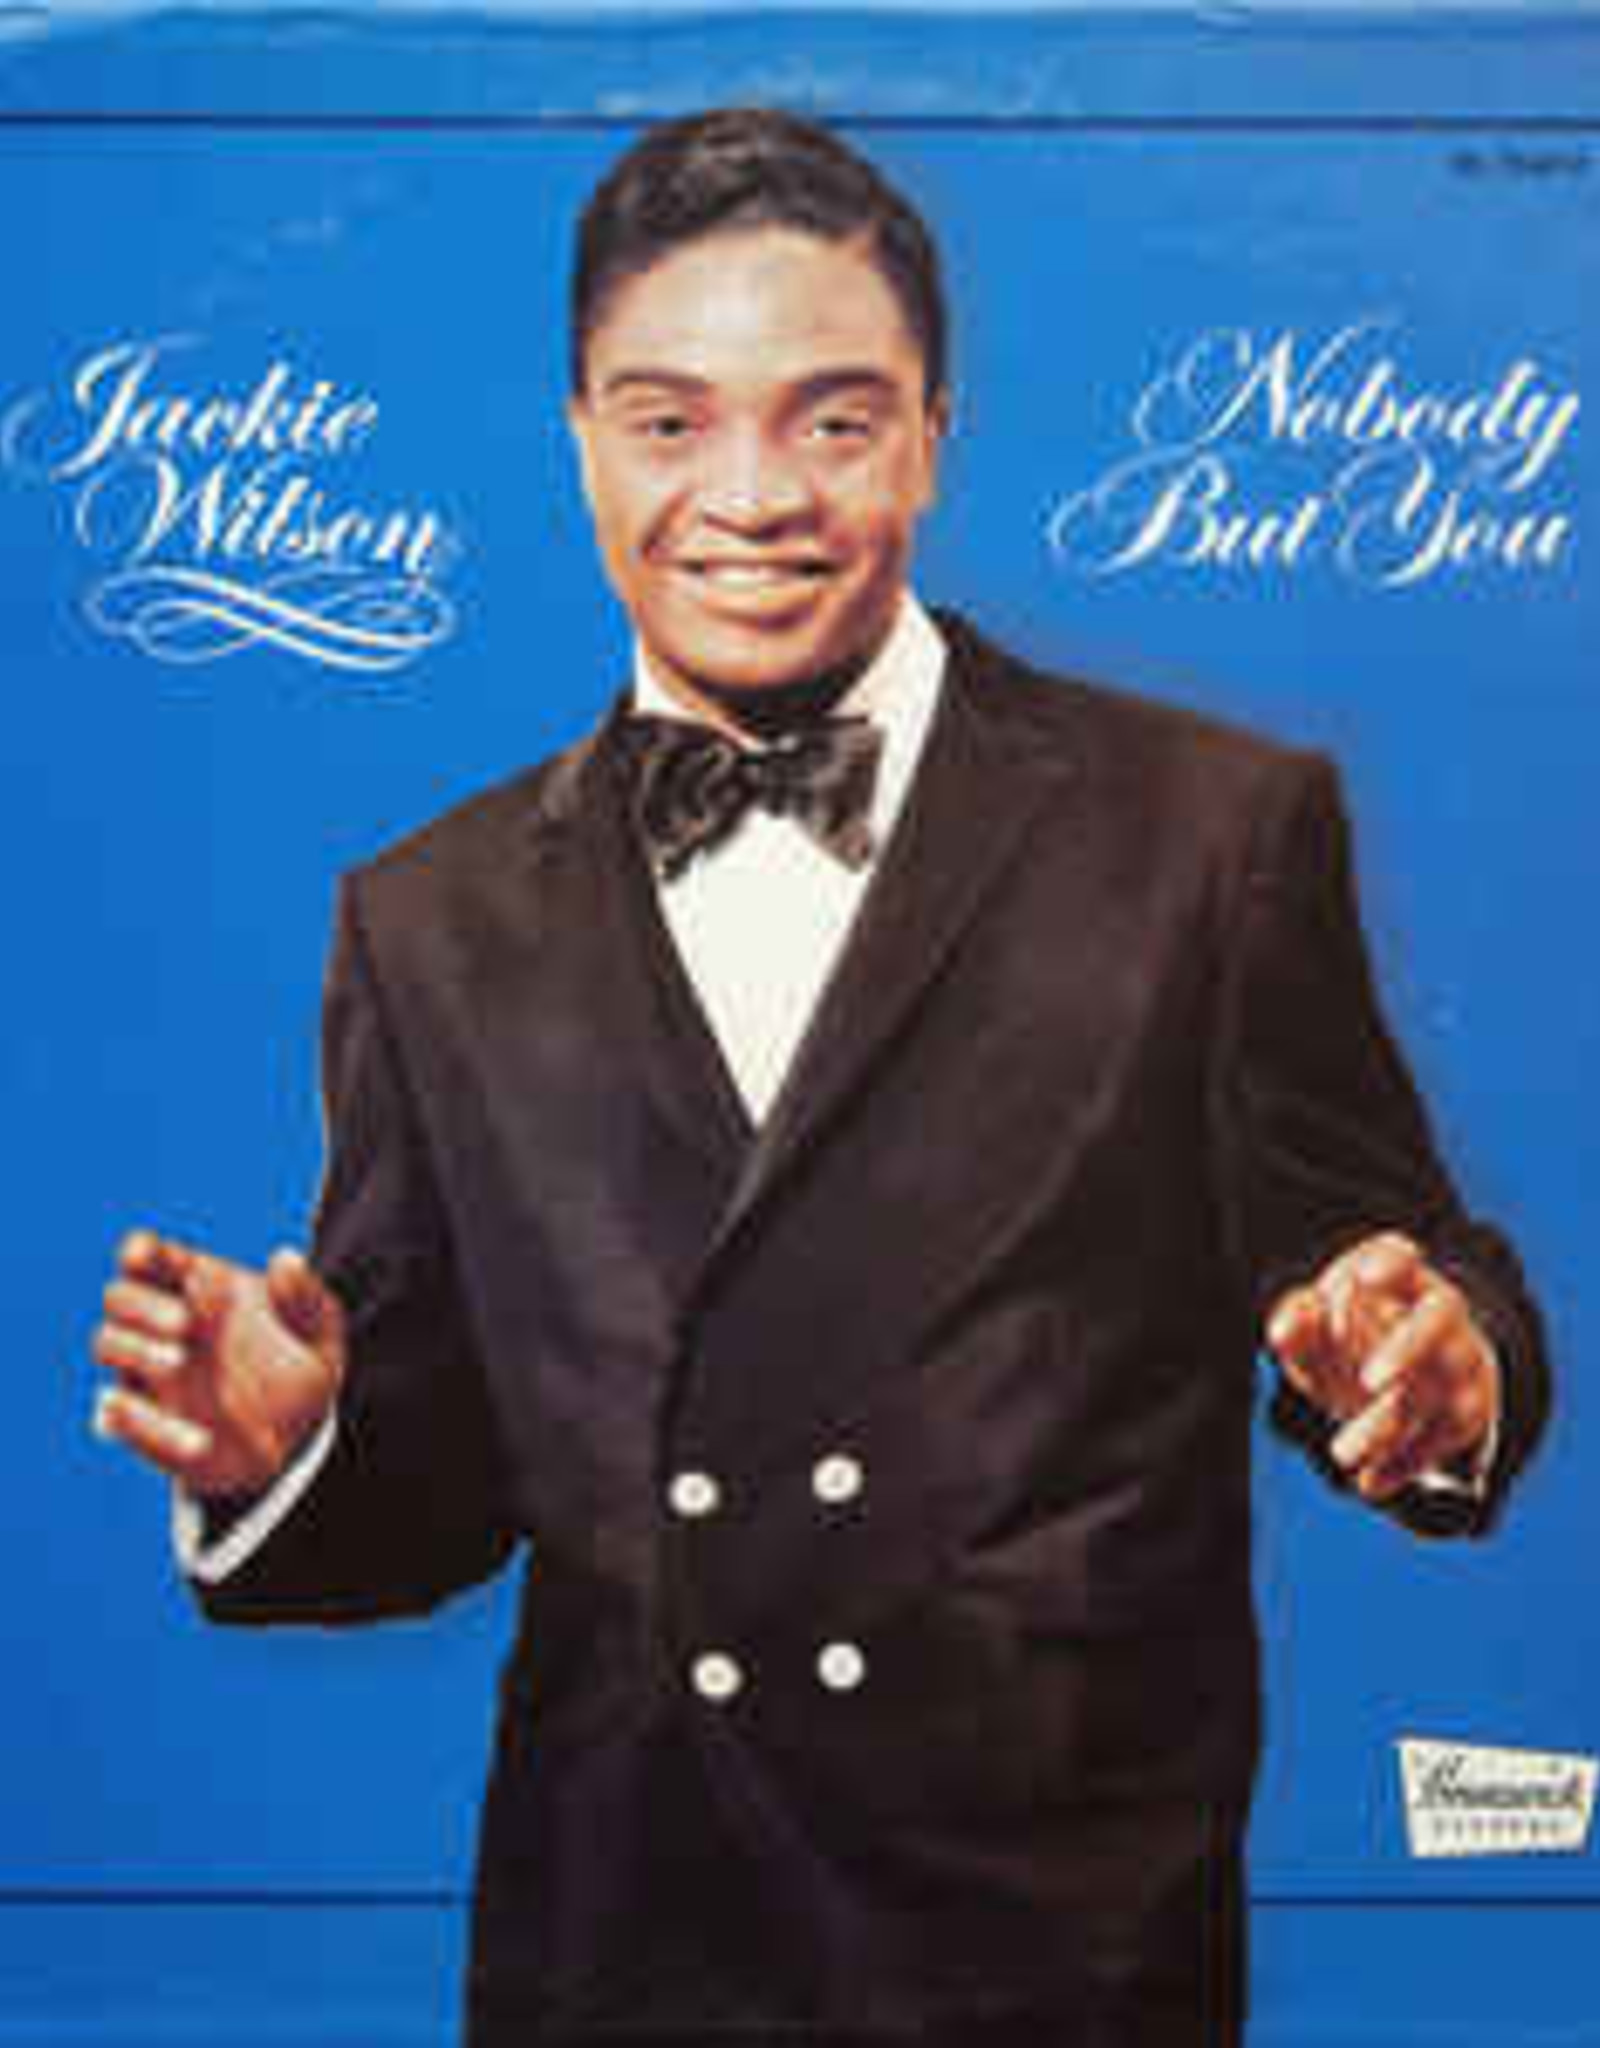 Jackie Wilson - Nobody But You (180 Gram)